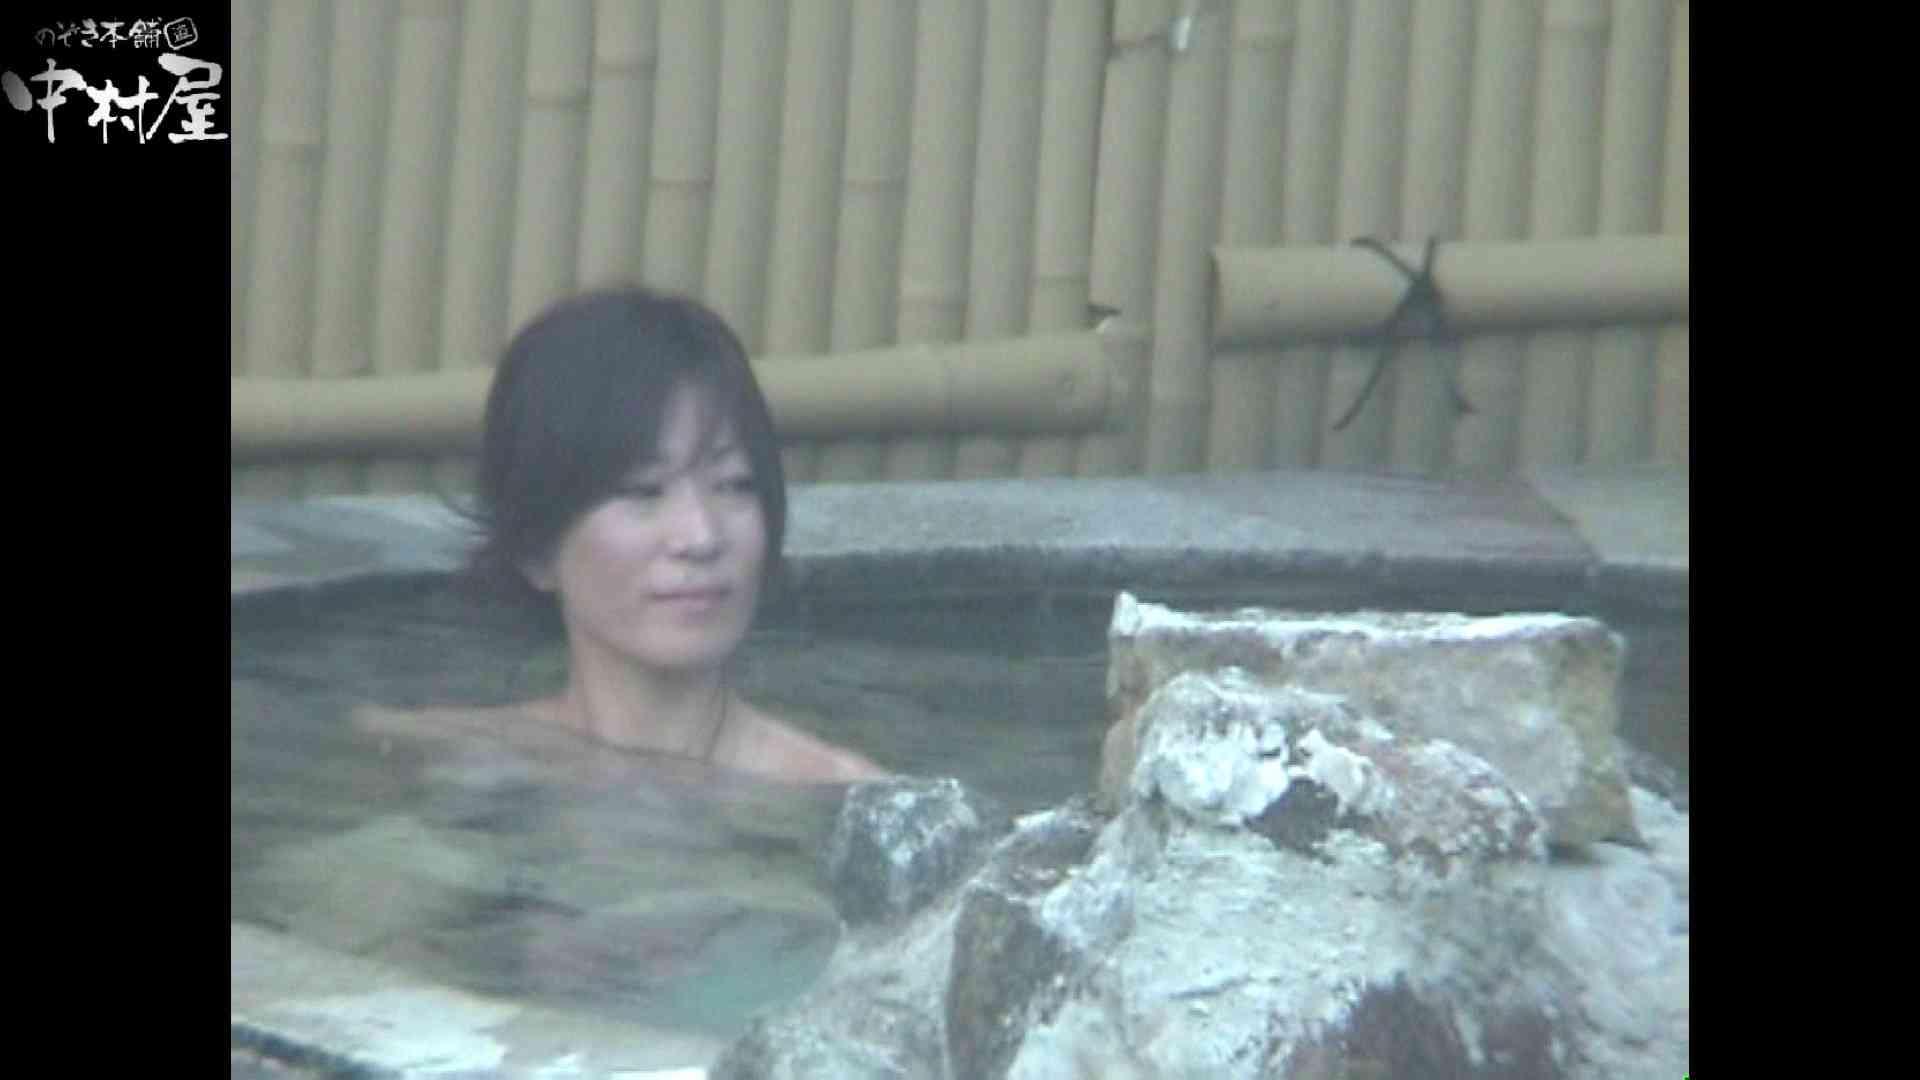 Aquaな露天風呂Vol.972 露天   OLセックス  80画像 28